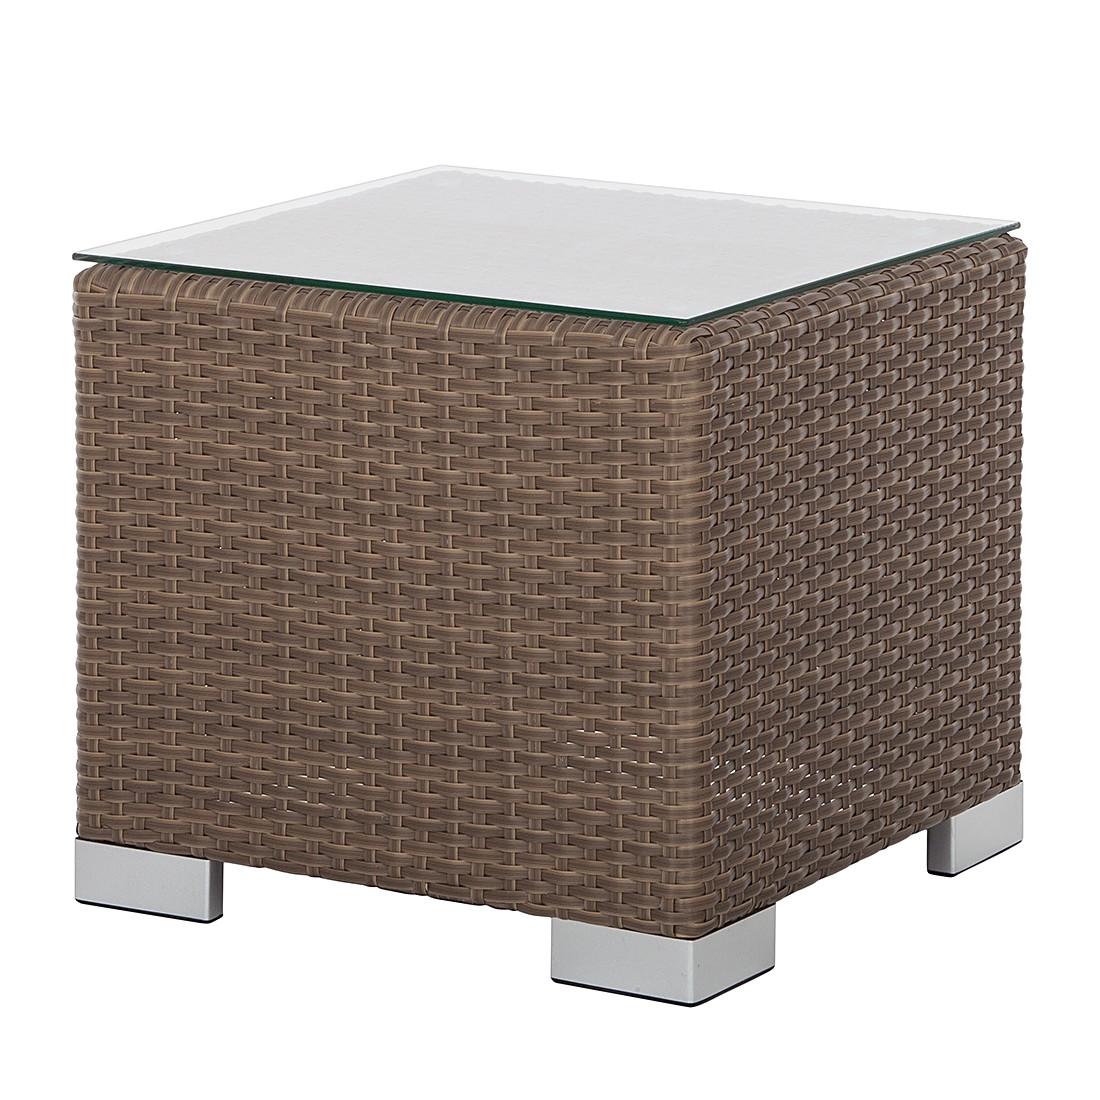 preisvergleich eu polyrattan sofa braun. Black Bedroom Furniture Sets. Home Design Ideas